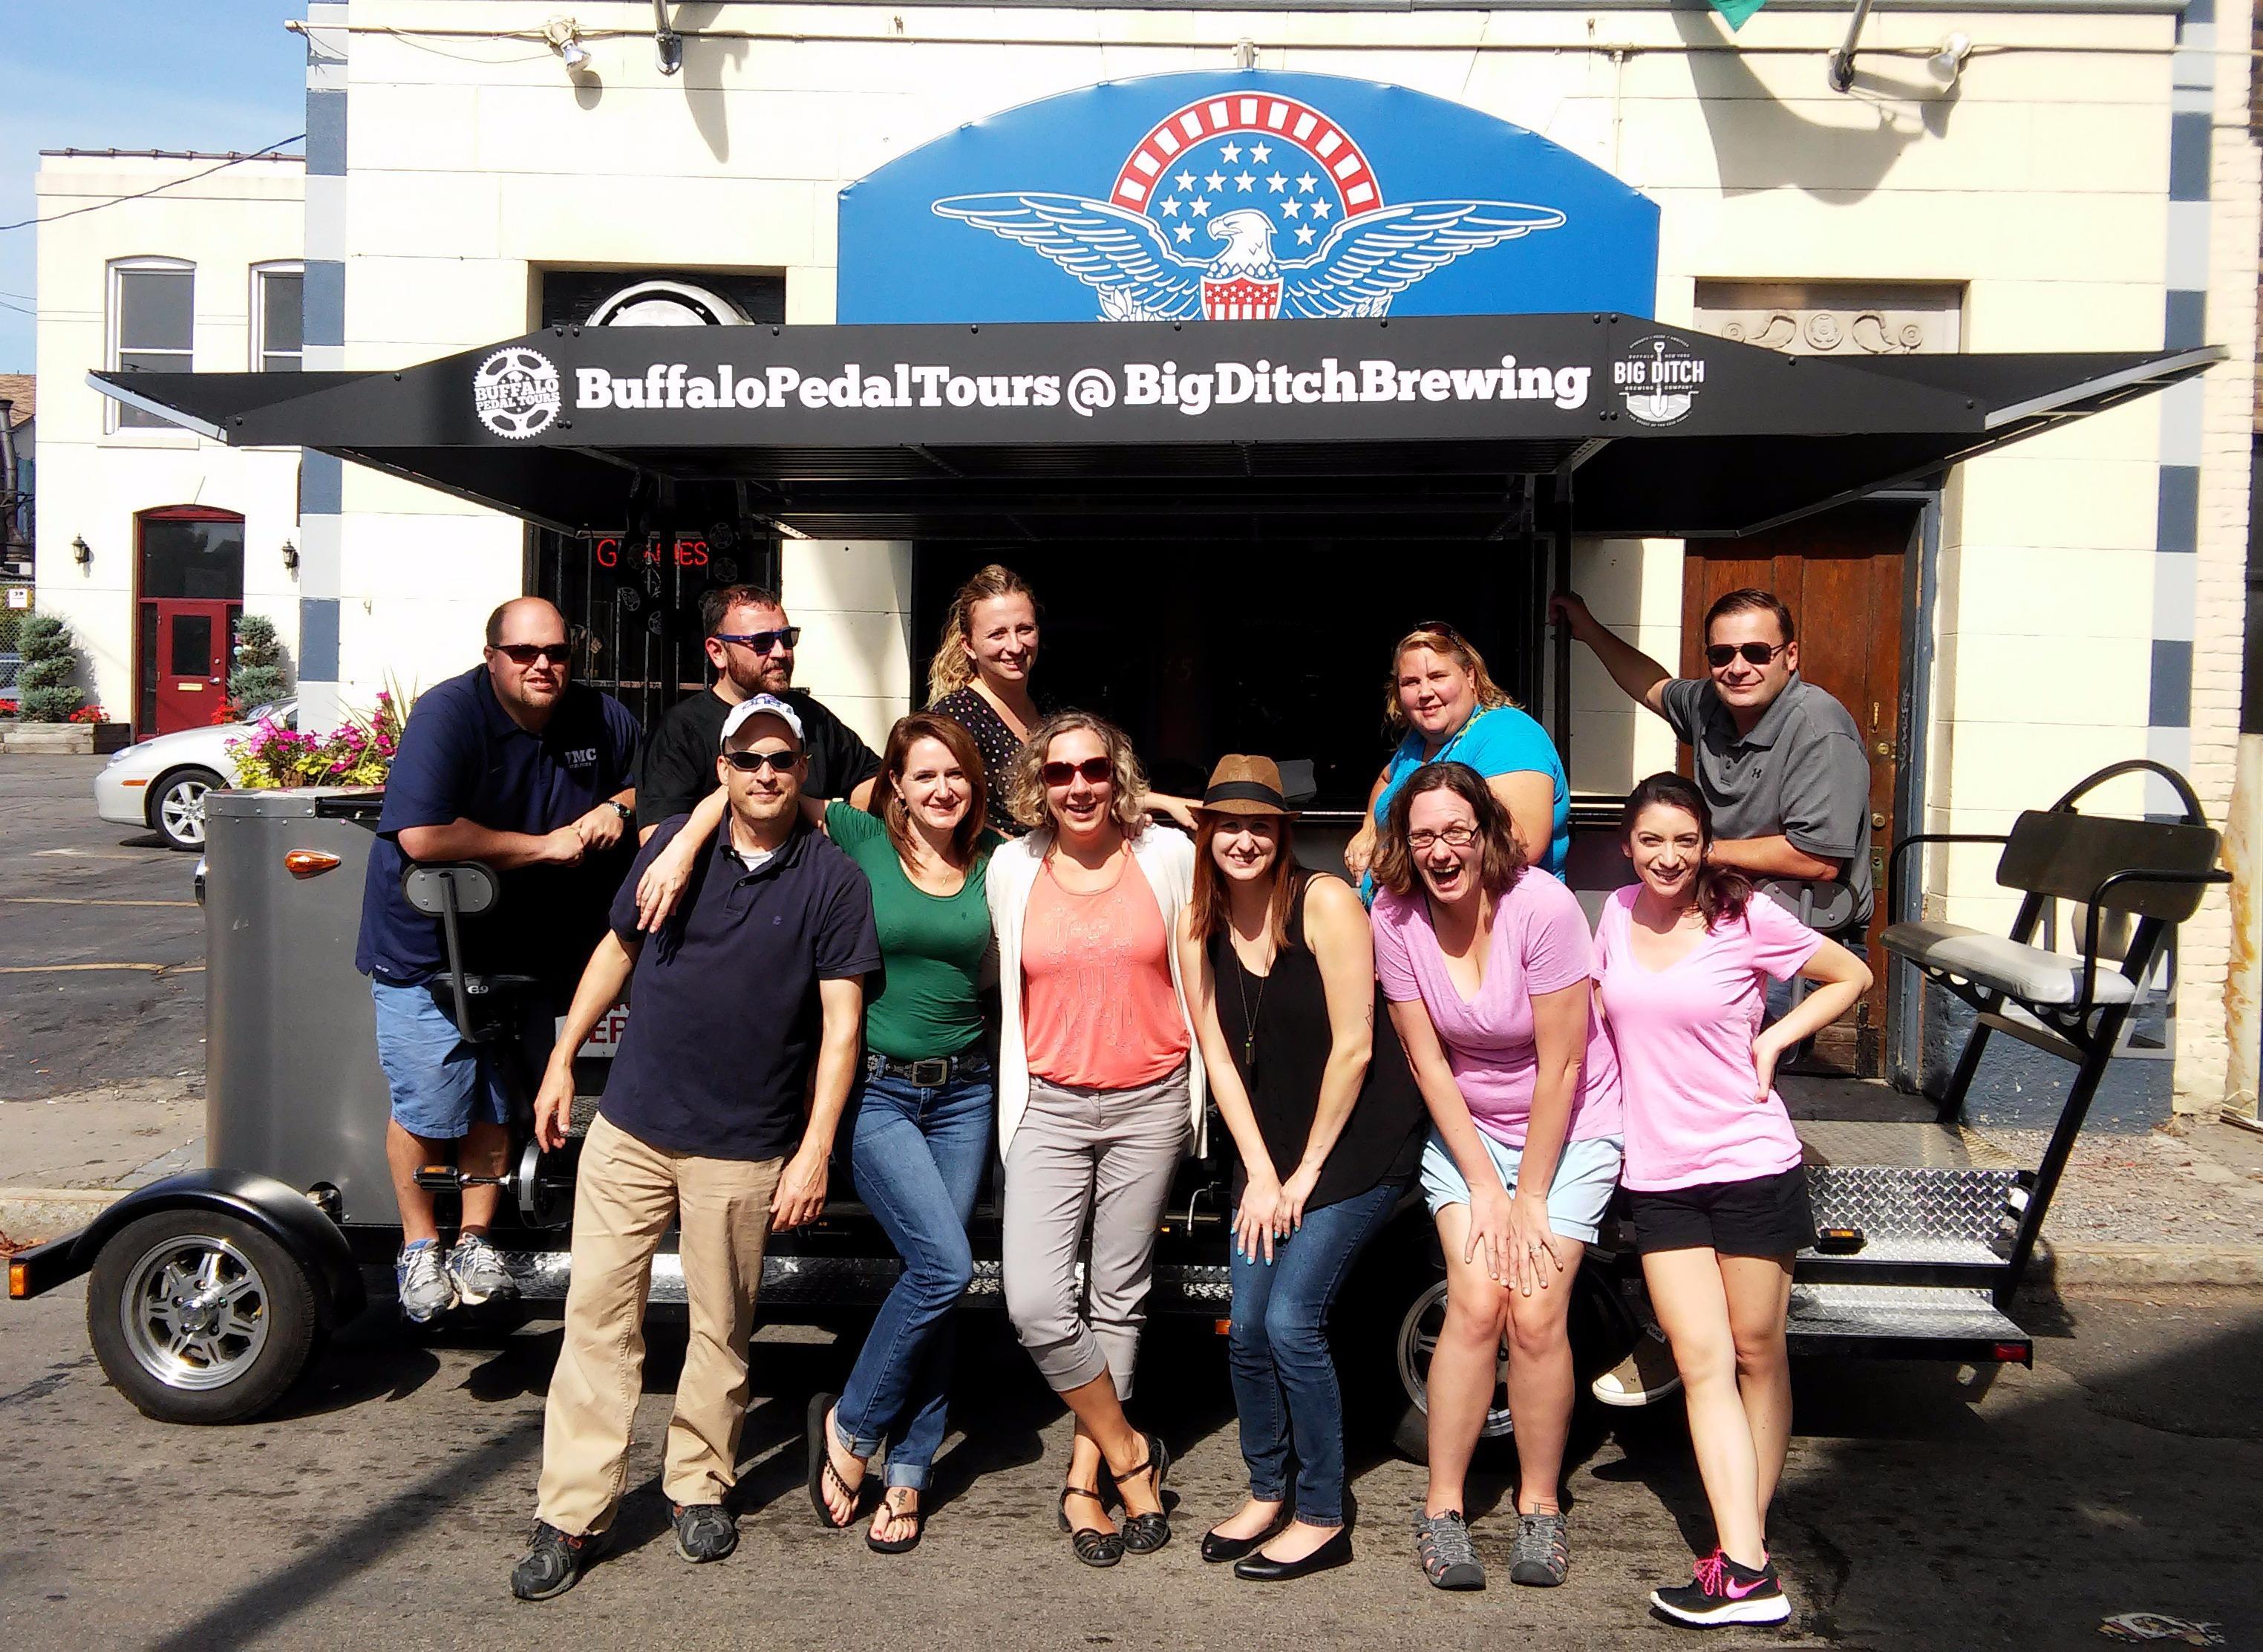 Buffalo Pedal Tours image 2